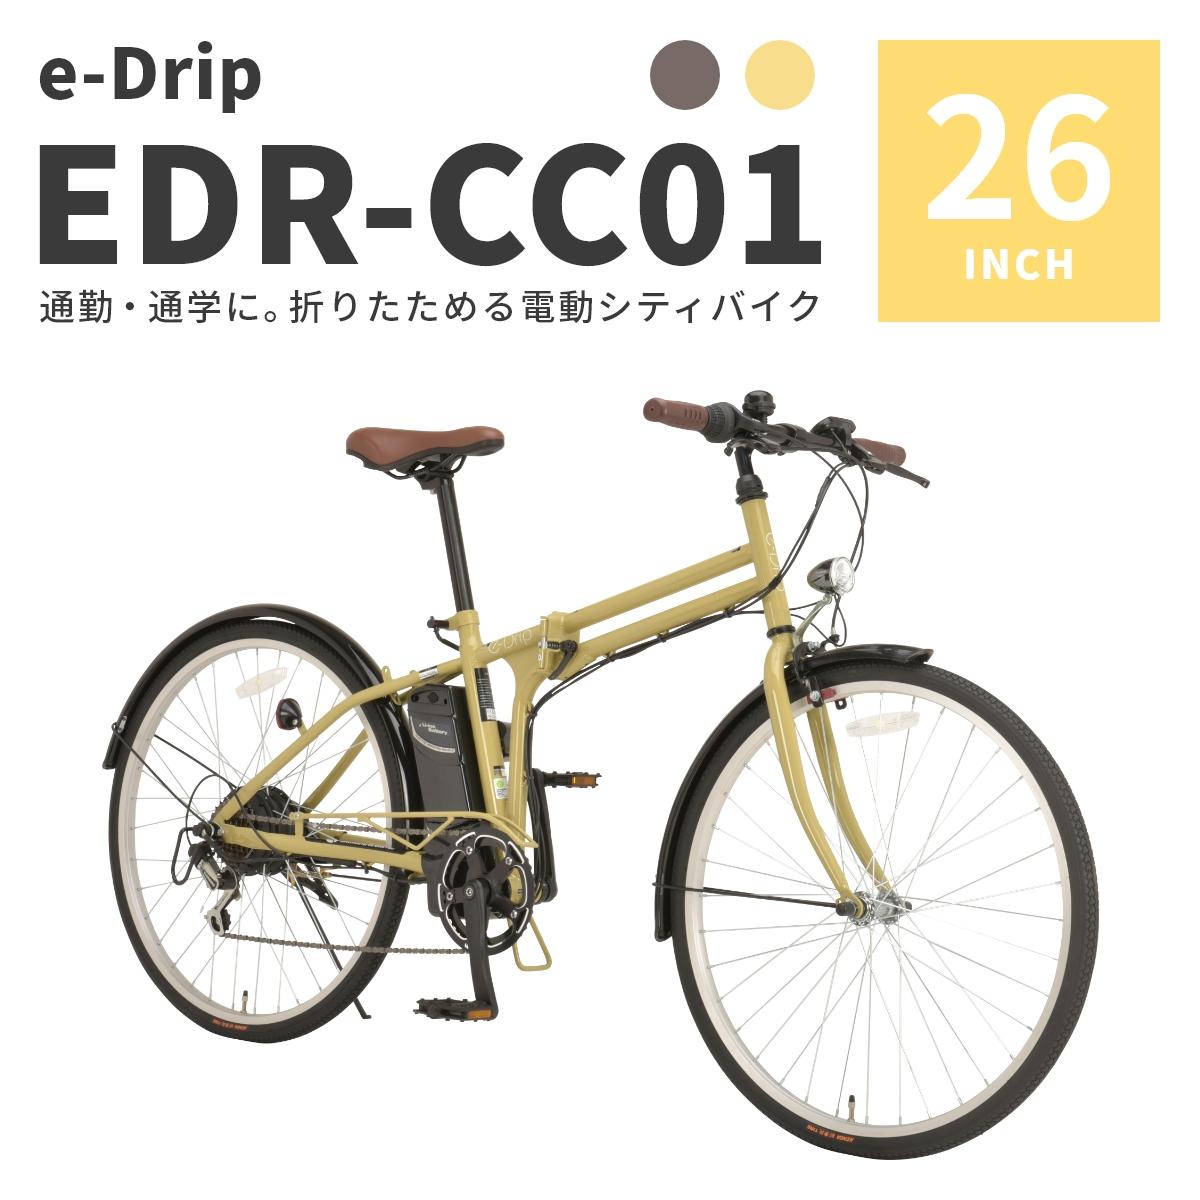 edr-cc01_ec_01